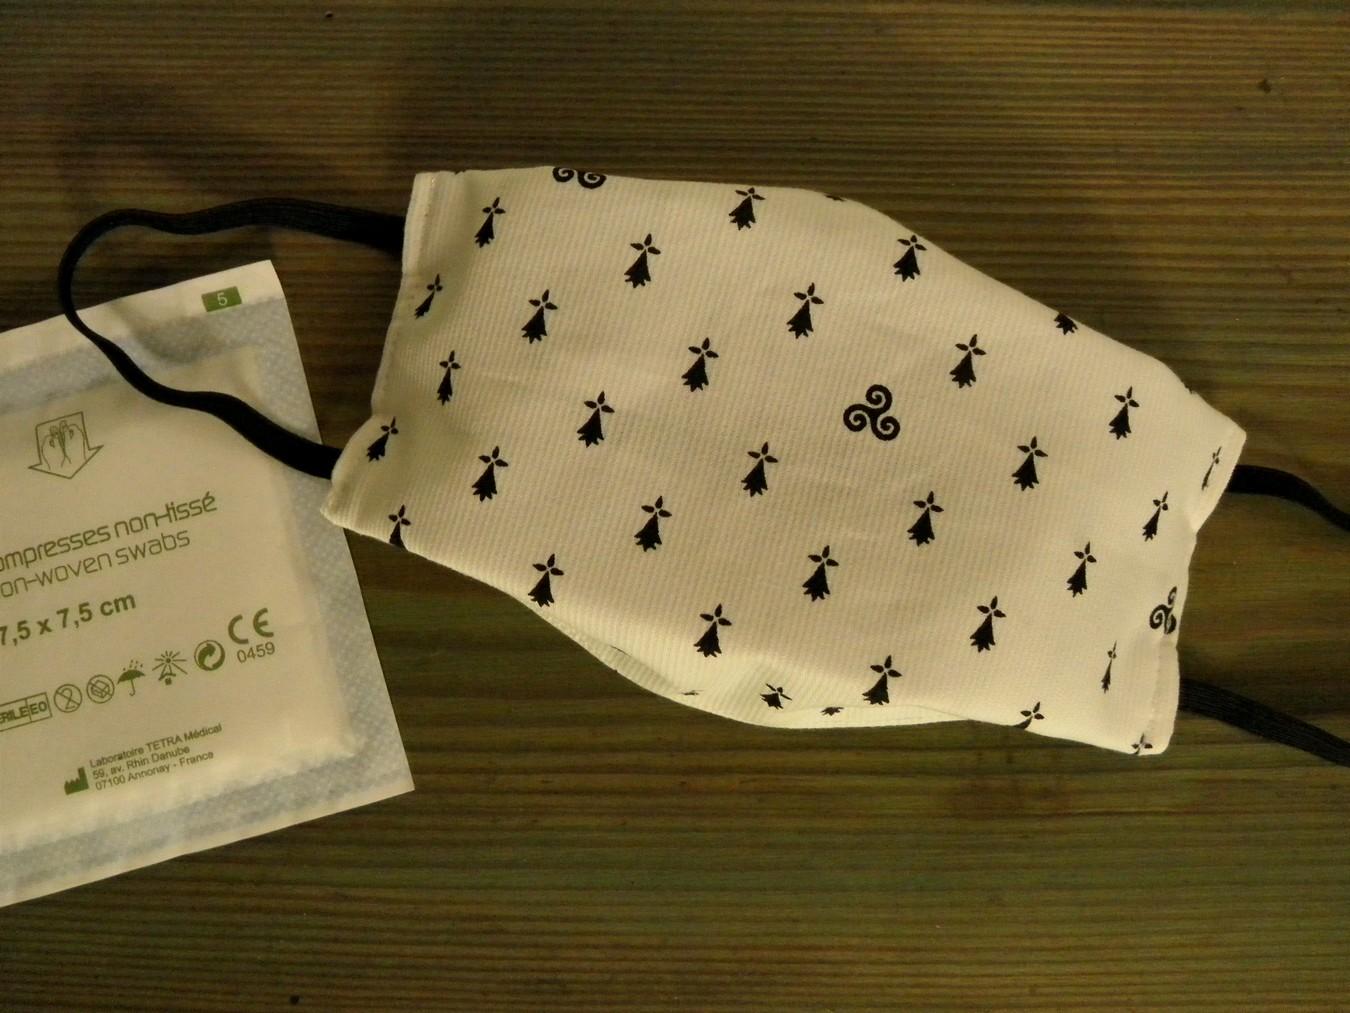 Masque-tissu-lavable-hermines.Breizh-RAINette.Produit-breton-